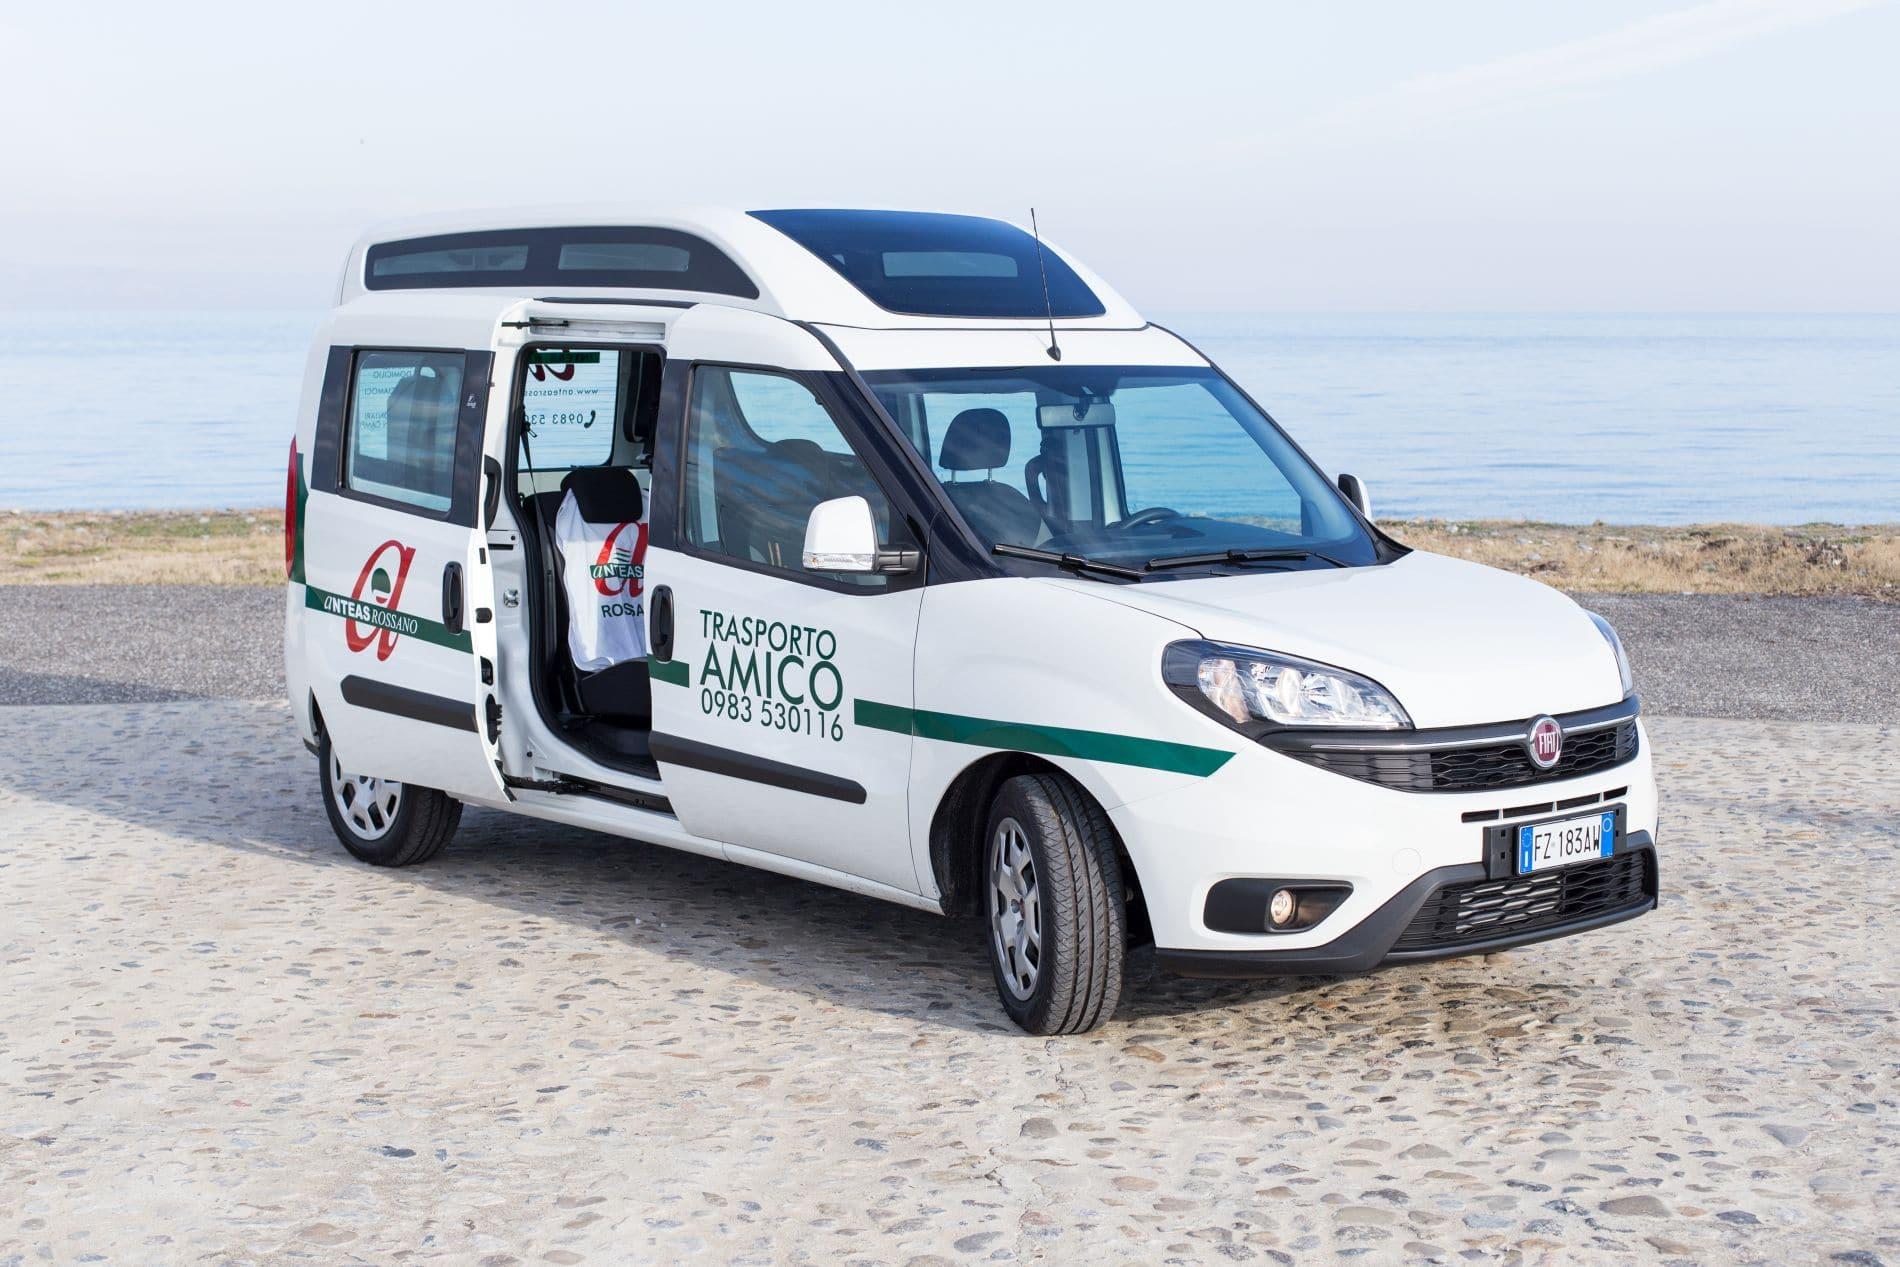 Trasporto Amico - Fiat Doblò - ANTEAS Rossano